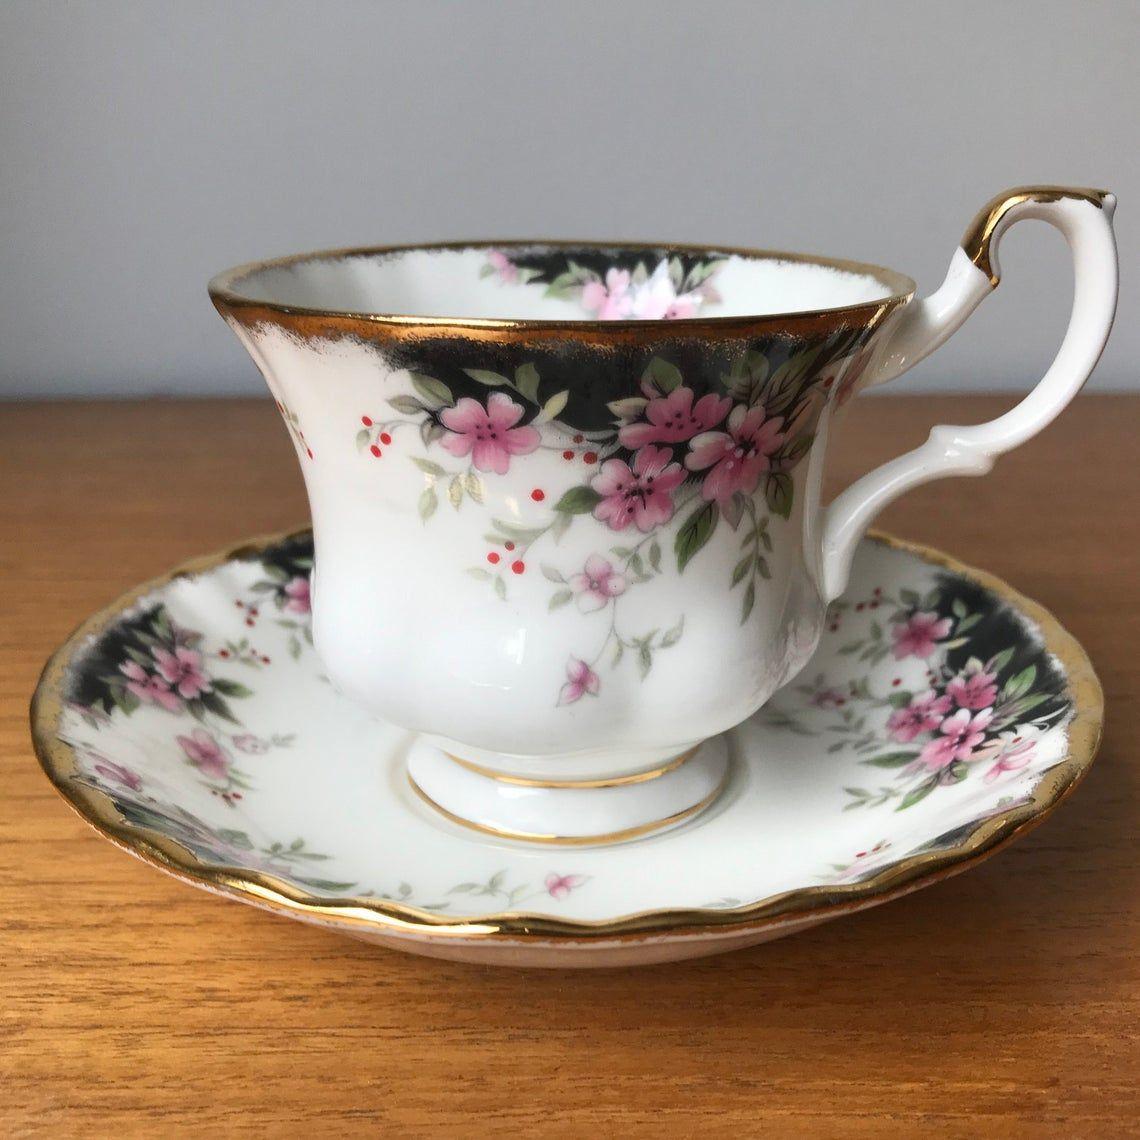 Royal Albert China Tea Cup and Saucer, Royal Choice Series Balmoral Teacup and Saucer, Black Pink and Gold